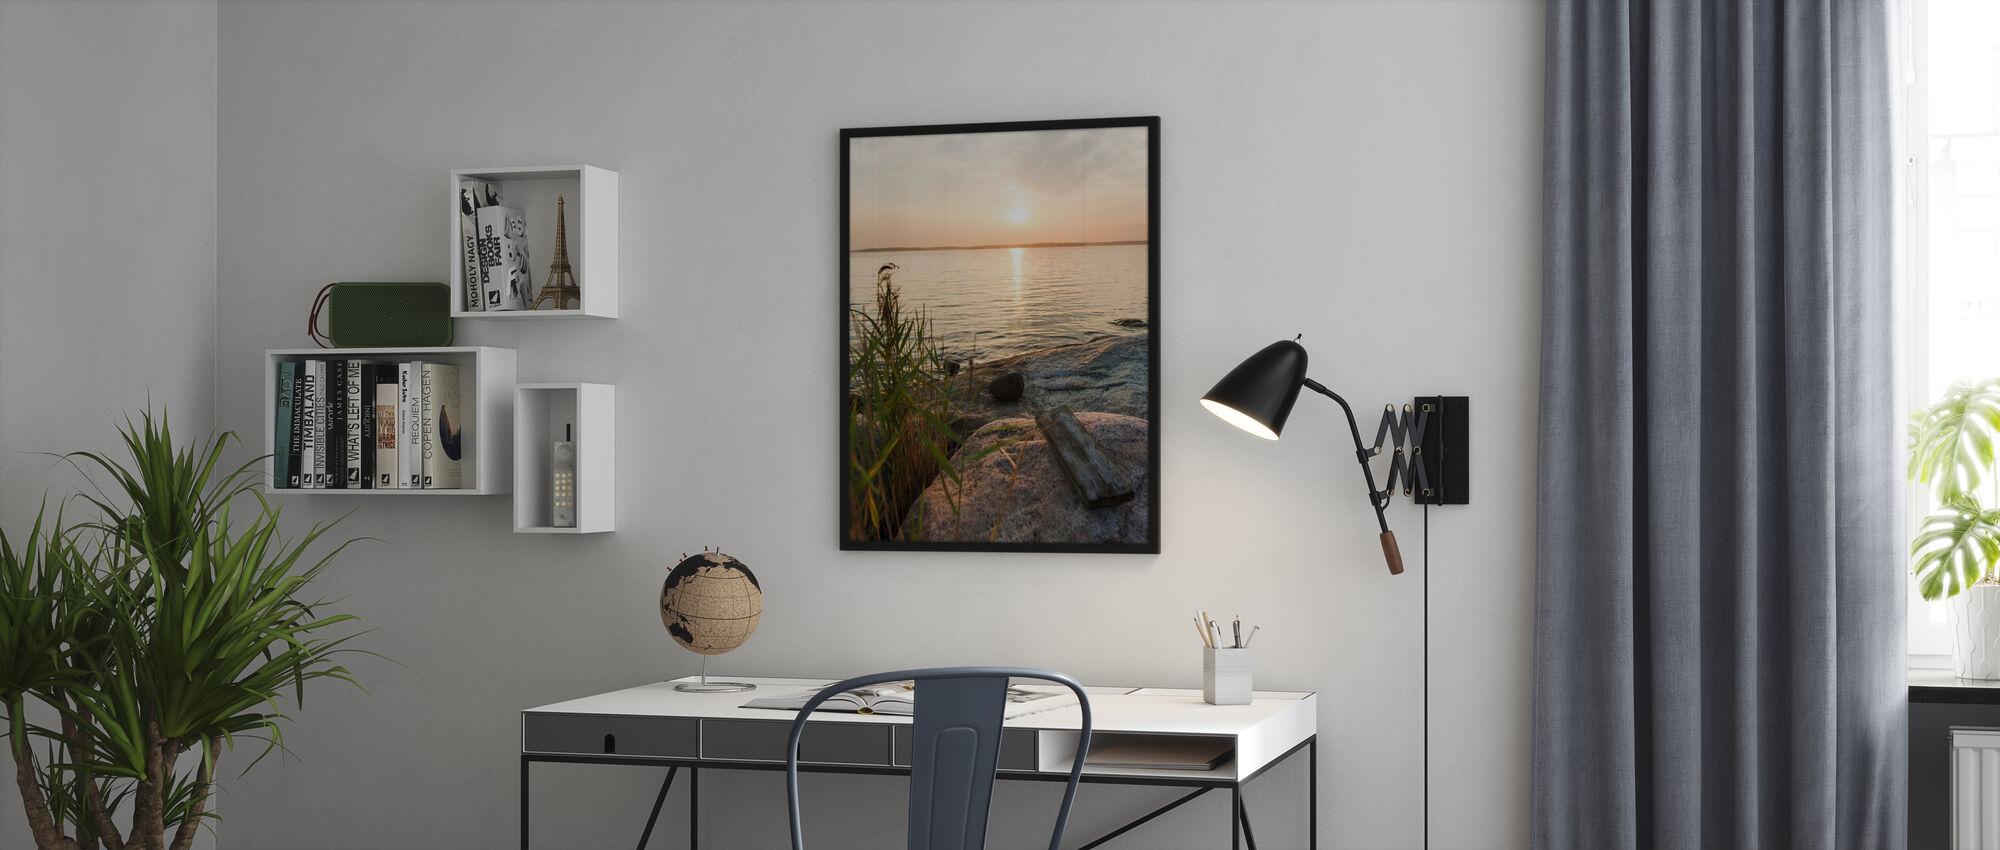 Sunset over Nässlingen, Sweden - Poster - Office